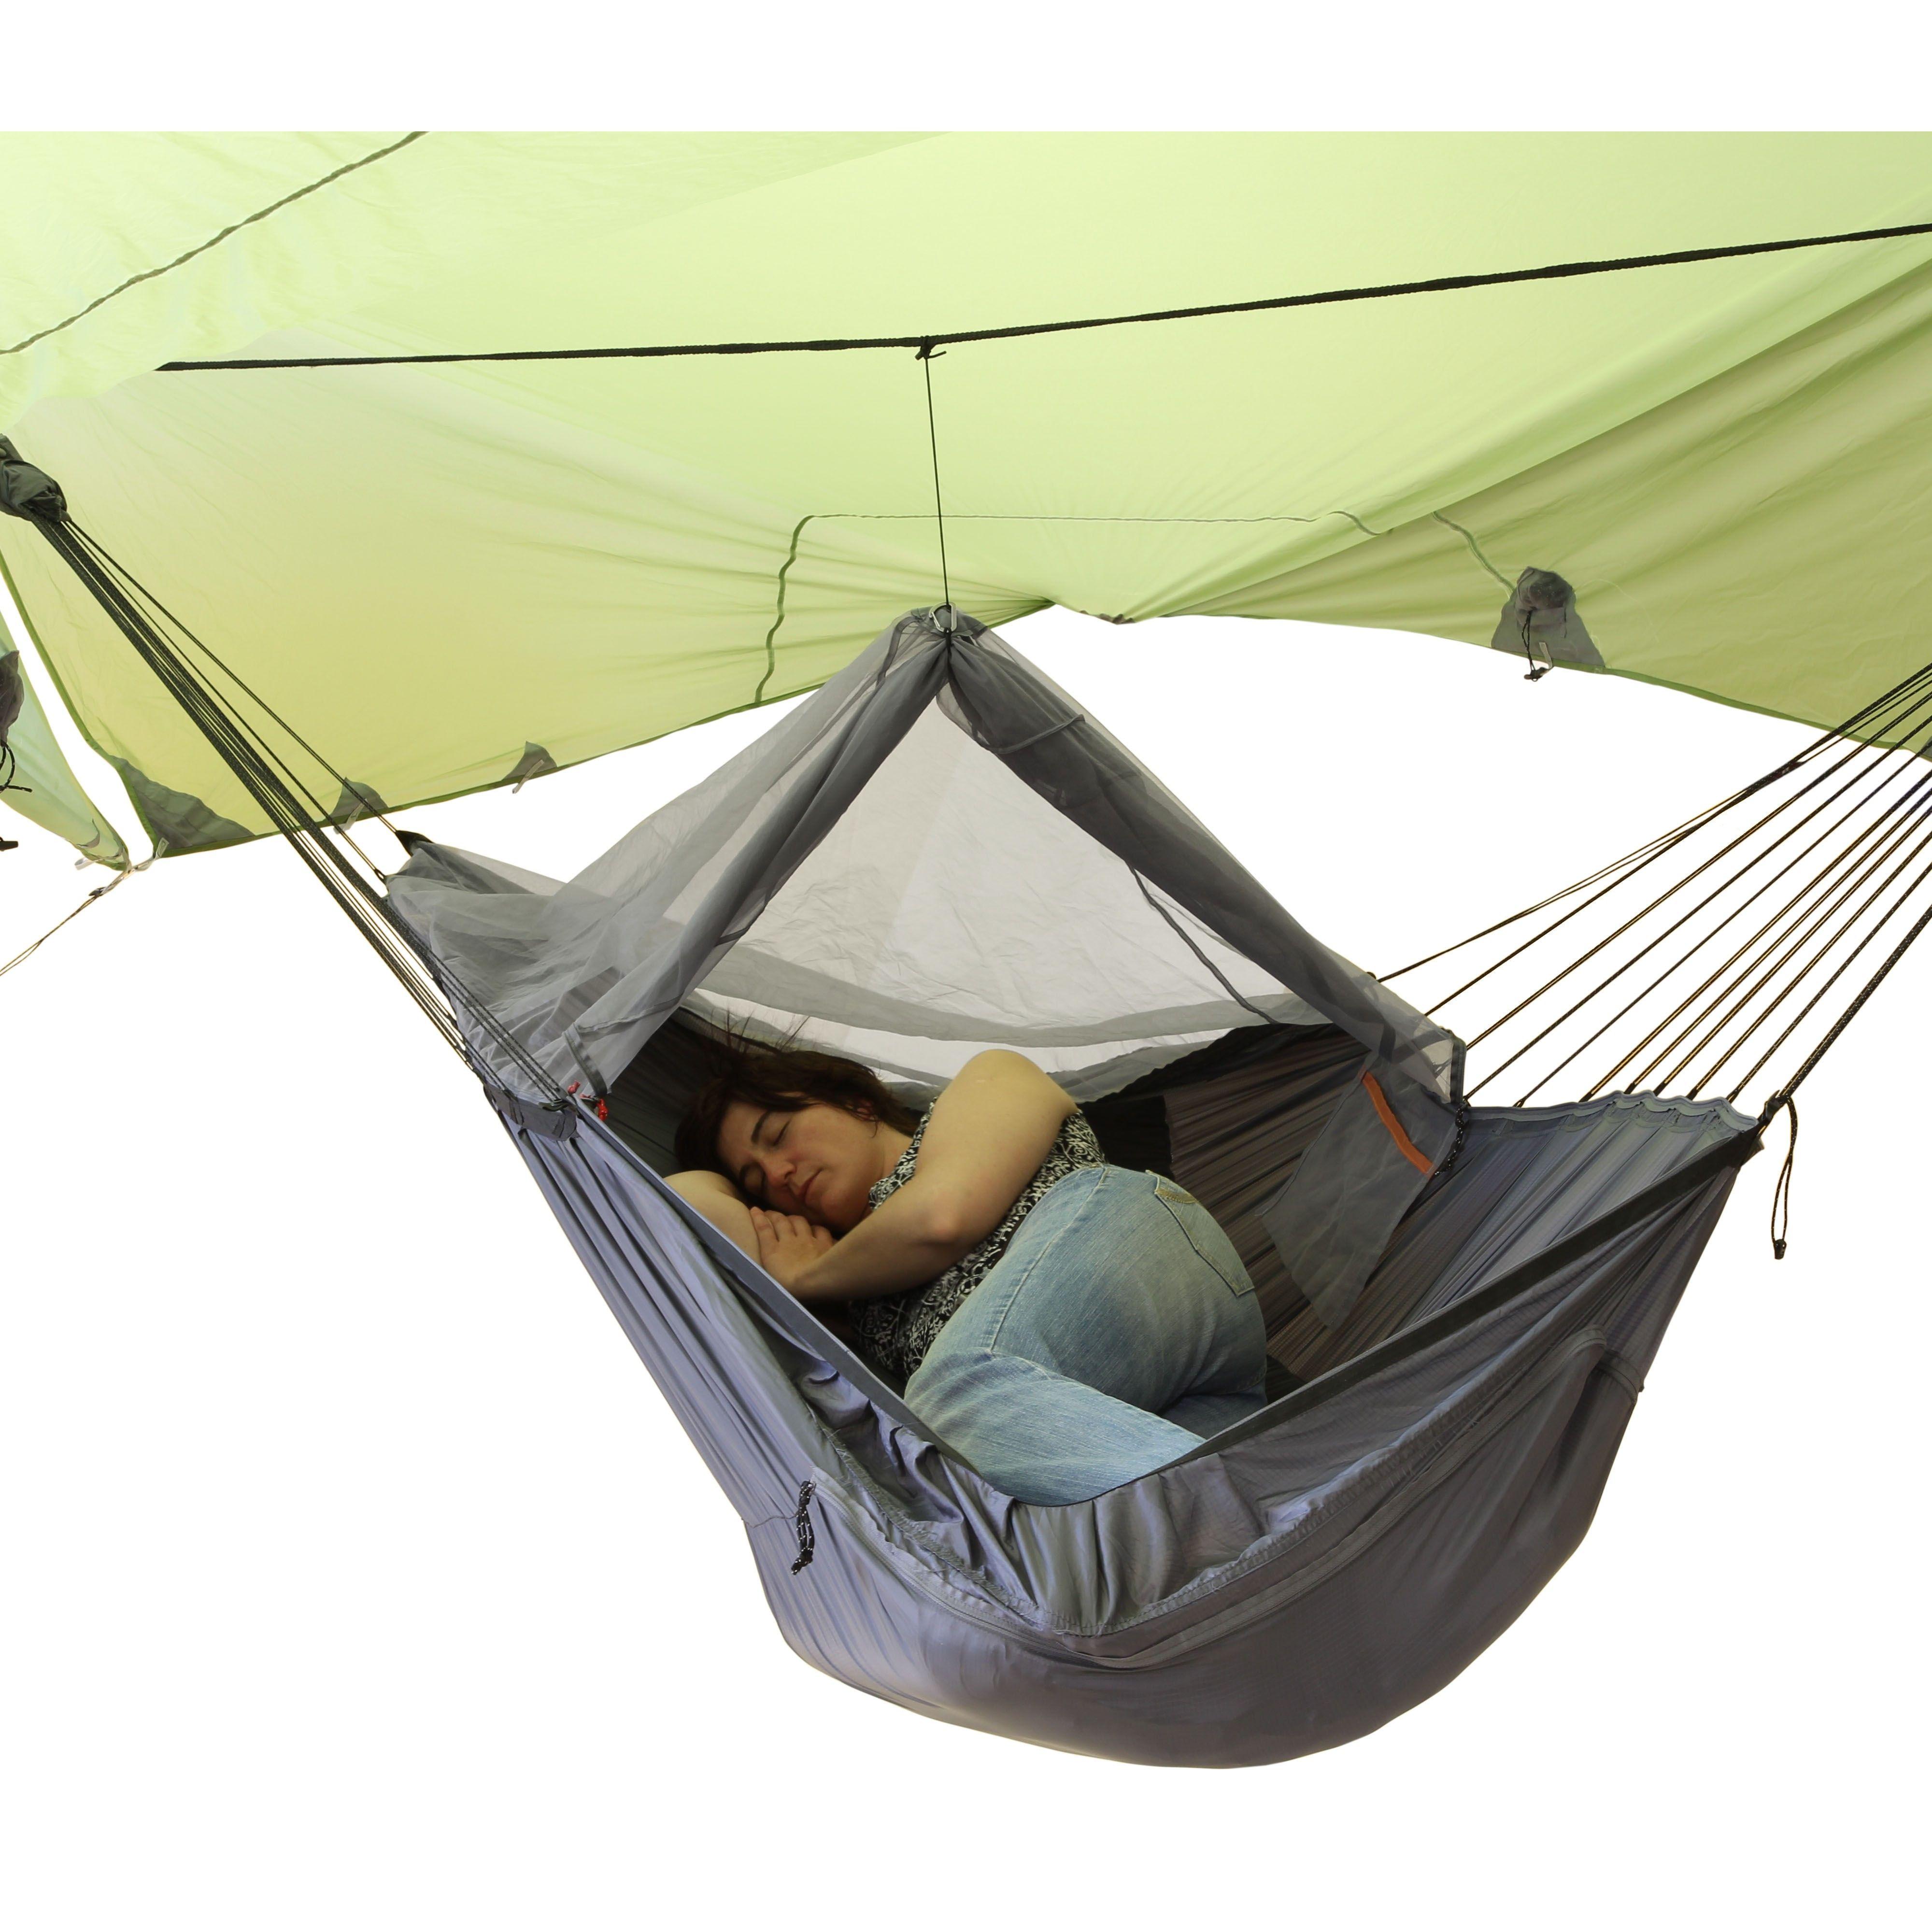 Ergo hammock combi camping pinterest survival